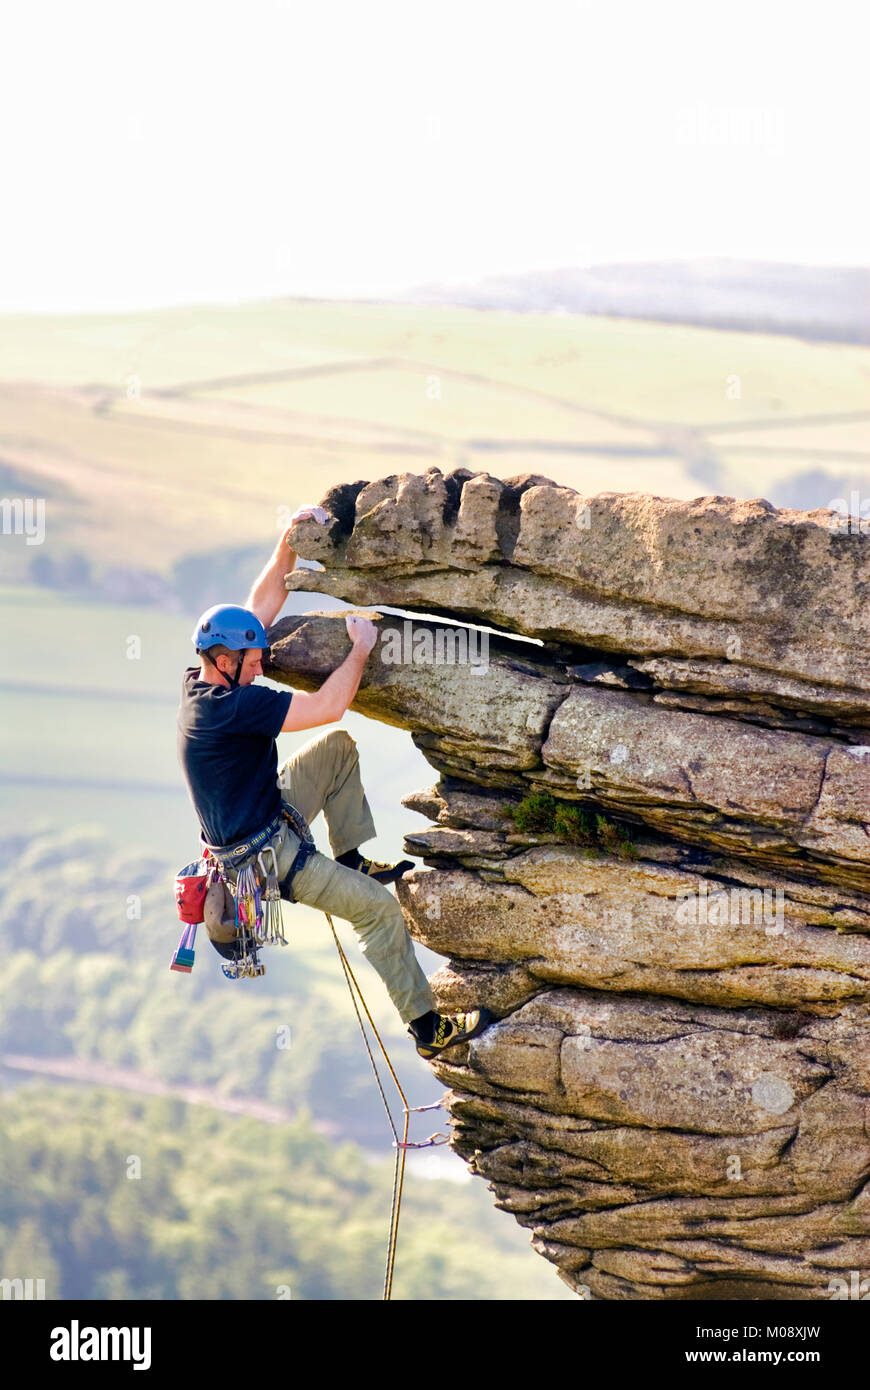 Rock climbing on Bamford Edge Peak District National Park, Derbyshire - Stock Image